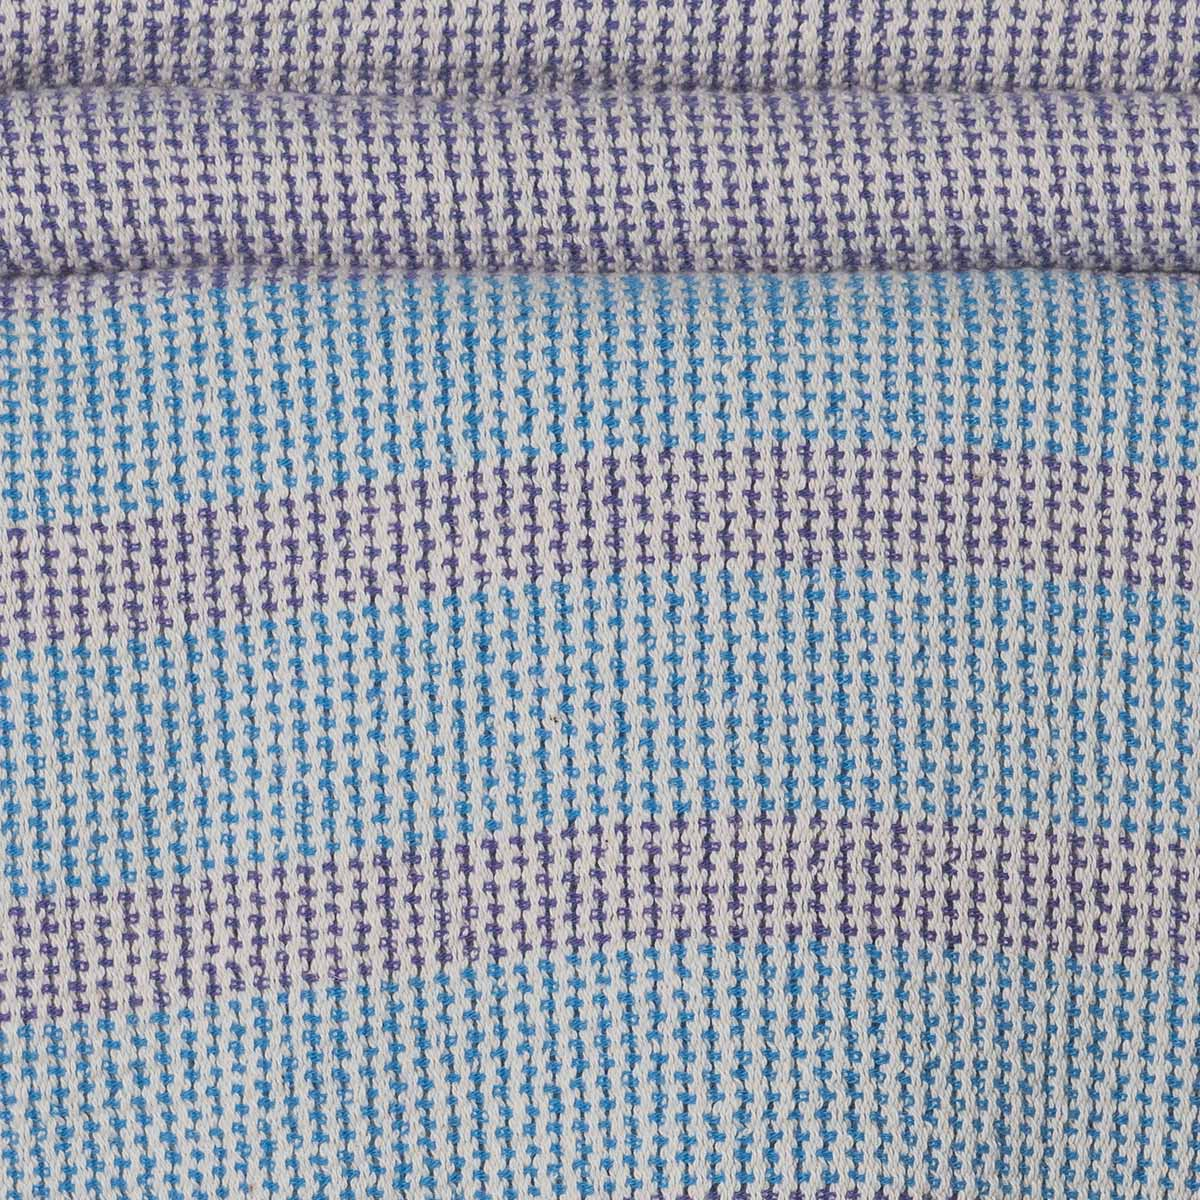 Pike Afra - Menekşe / Koyu Mavi